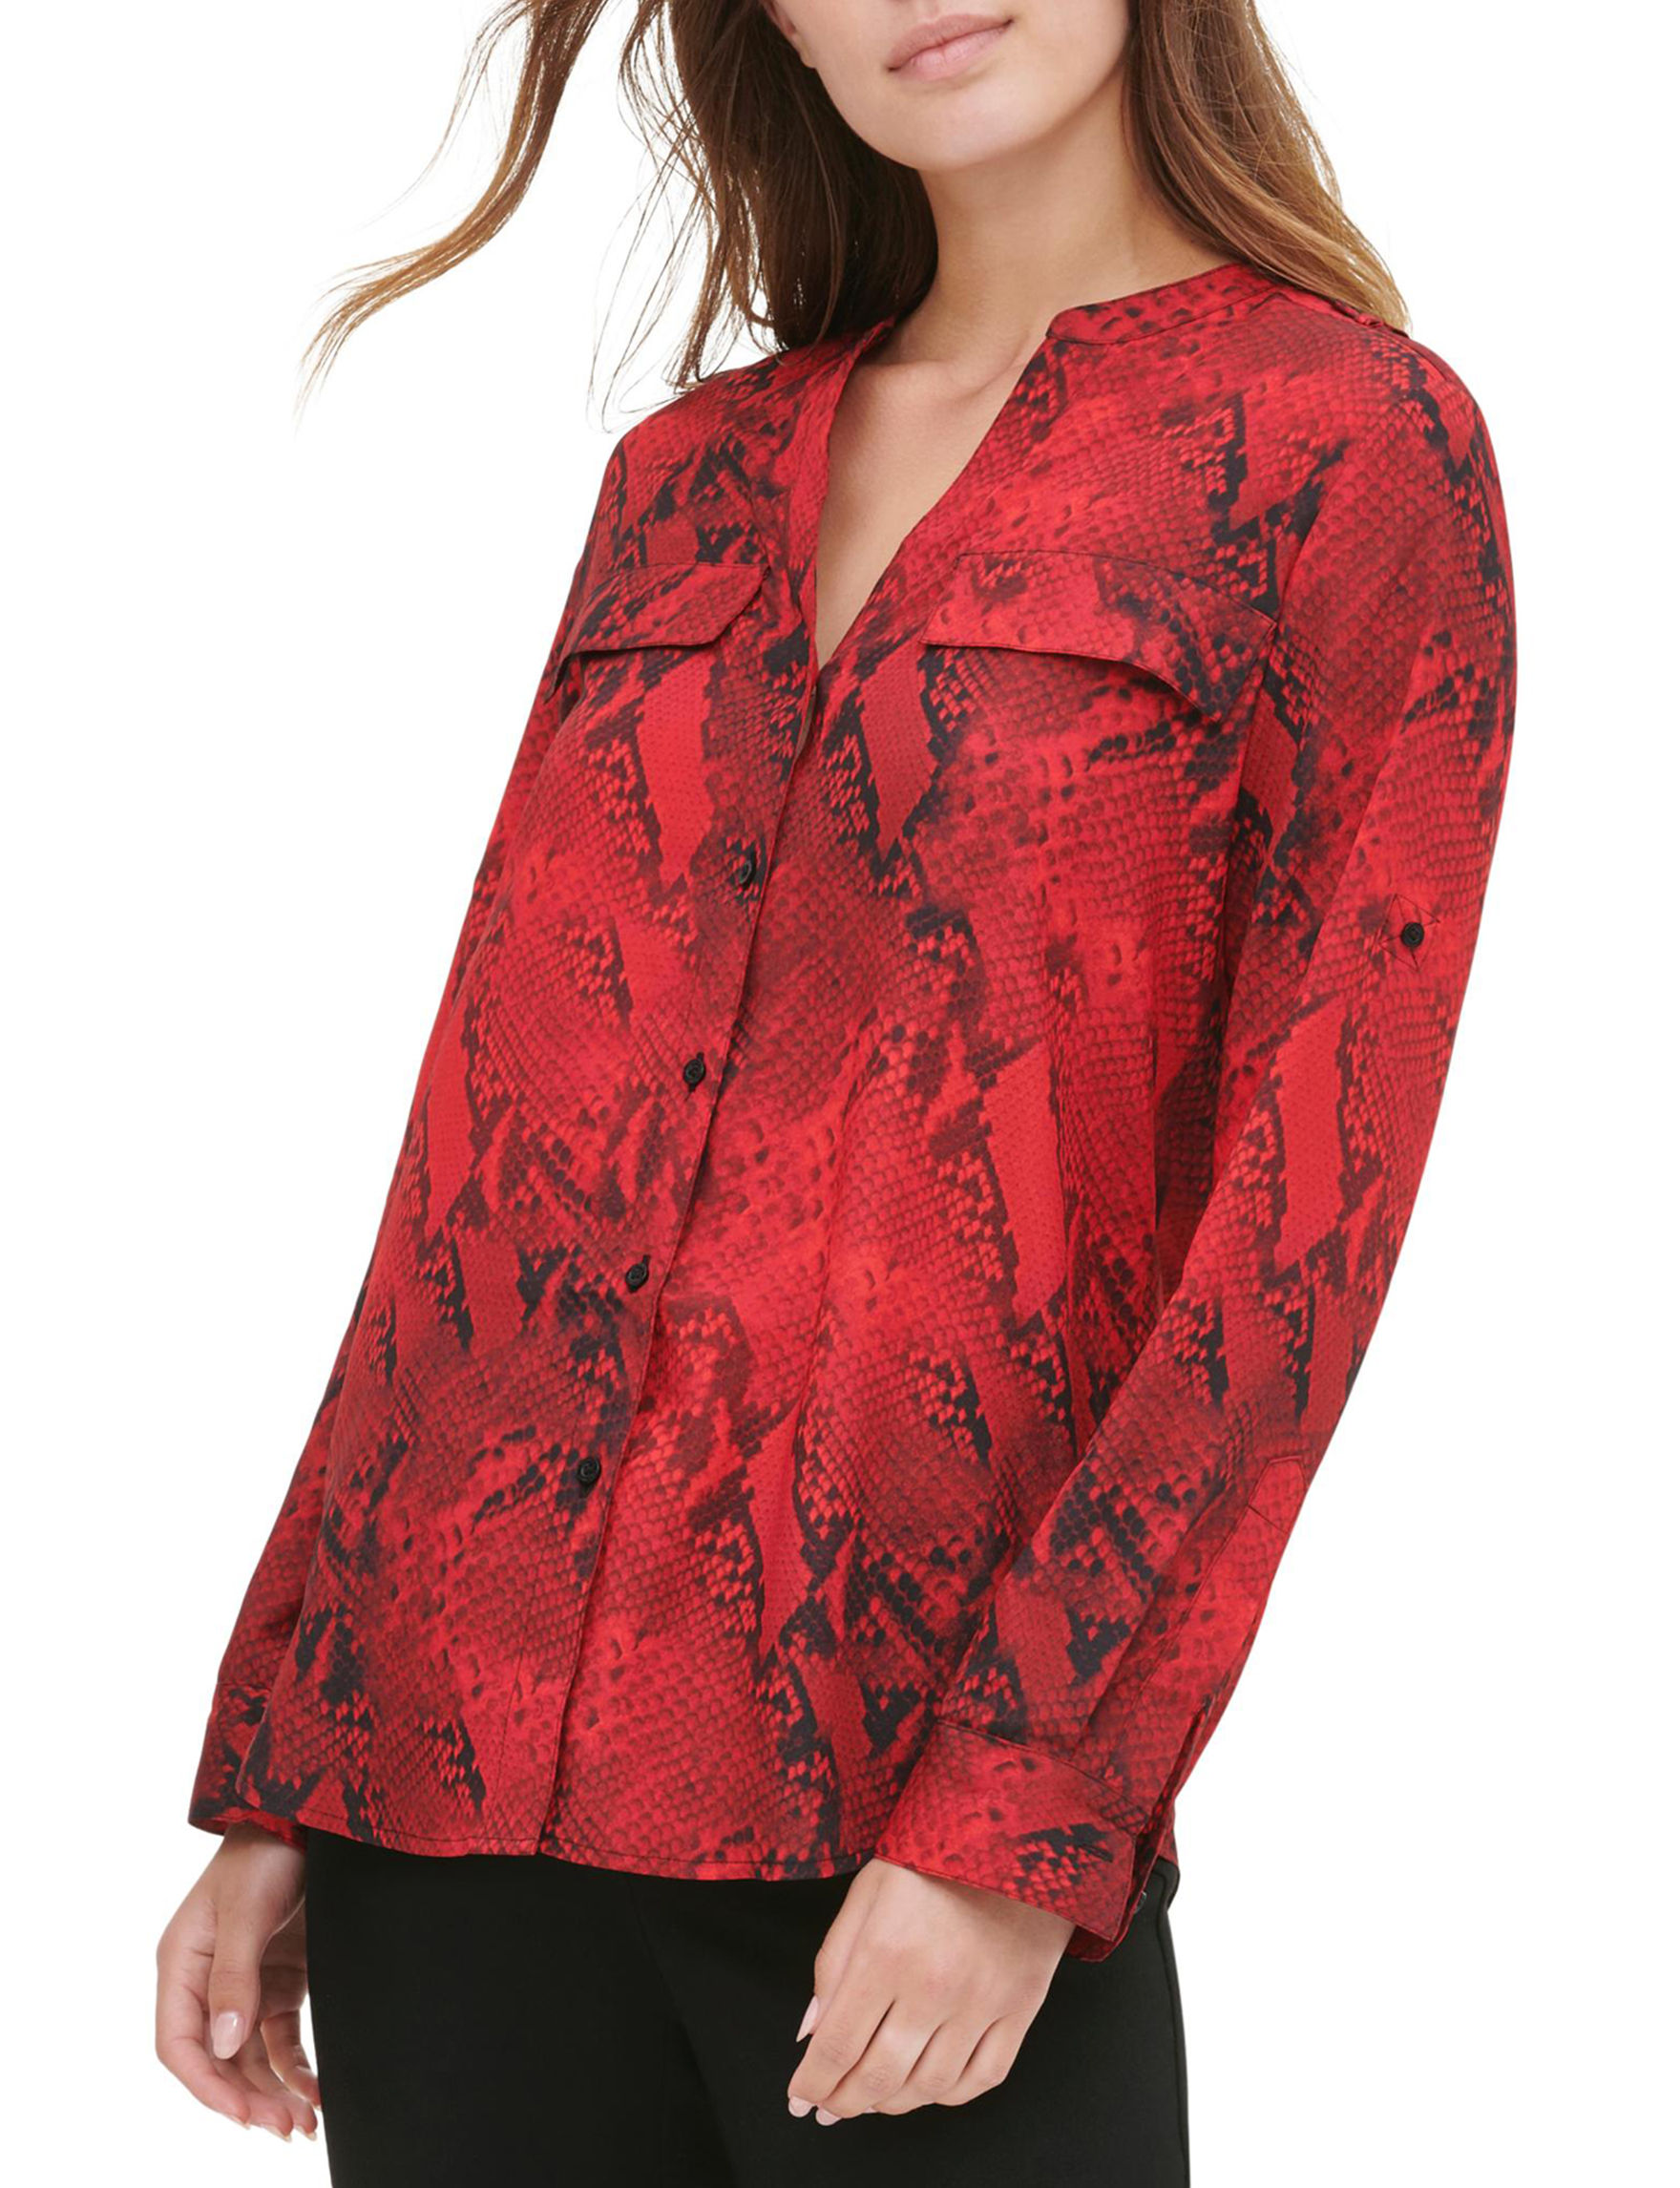 Calvin Klein Red / Black Shirts & Blouses